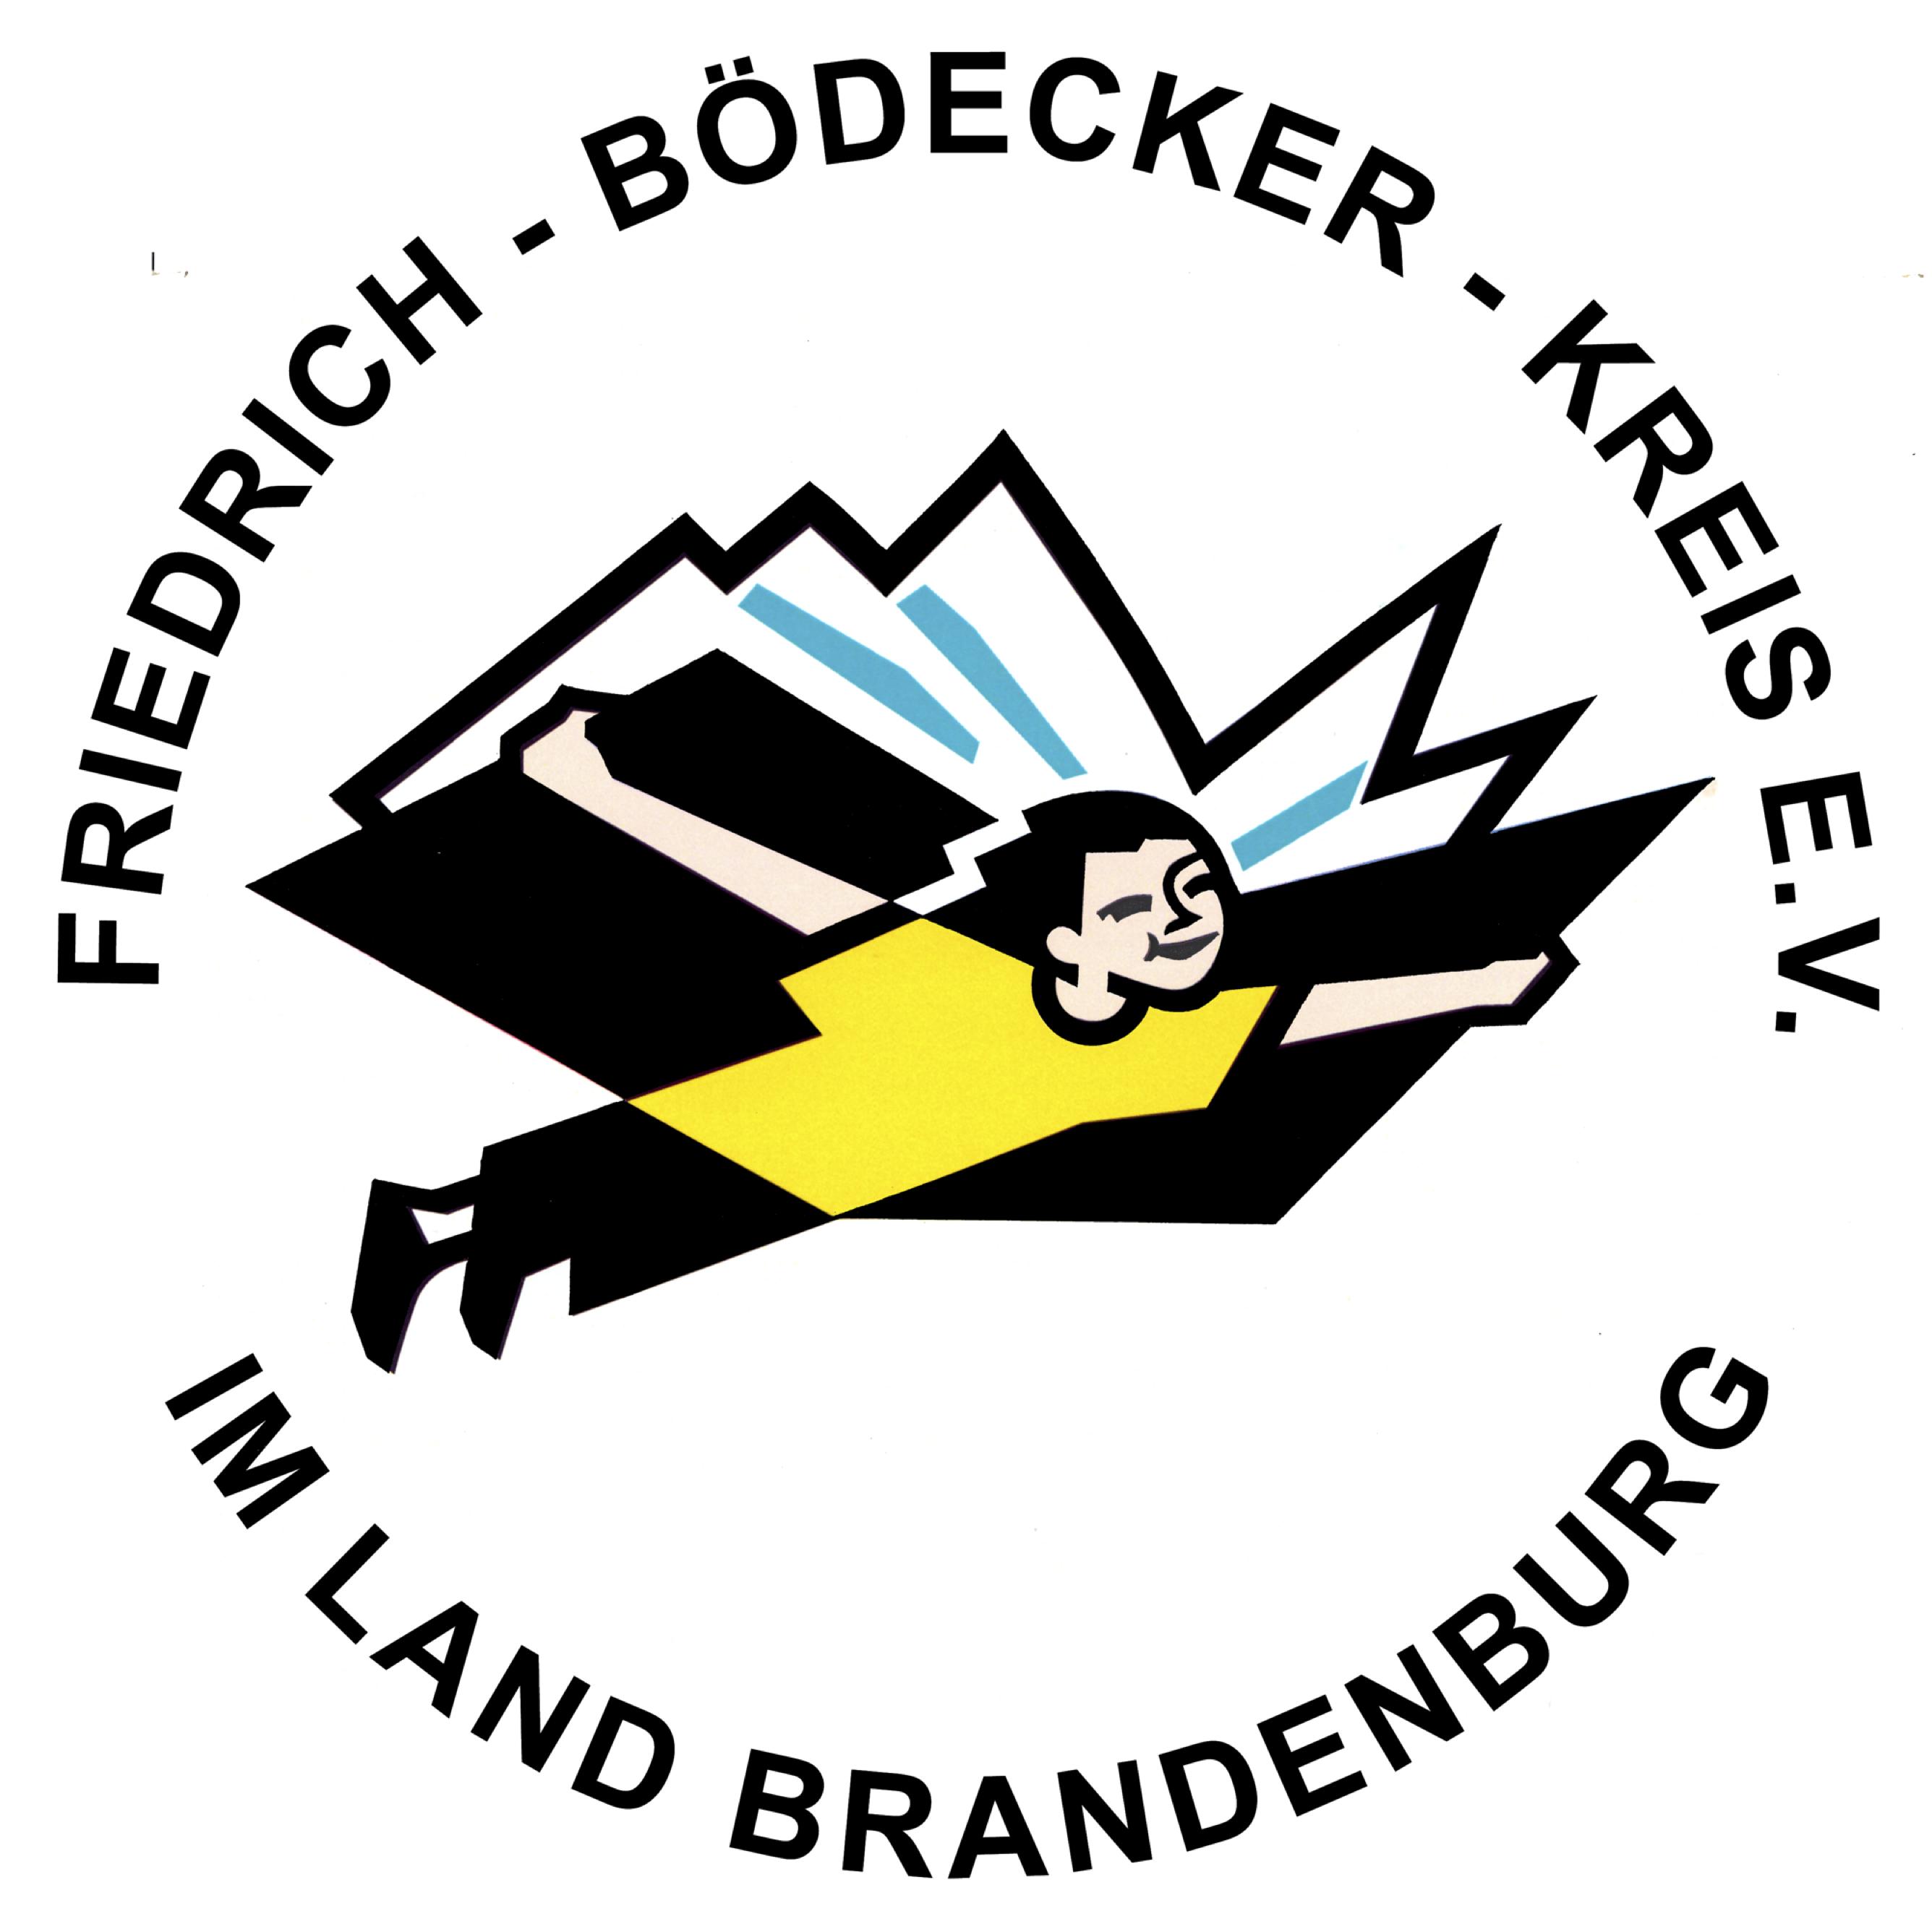 Friedrich-Bödecker-Kreis im Land Brandenburg e.V.